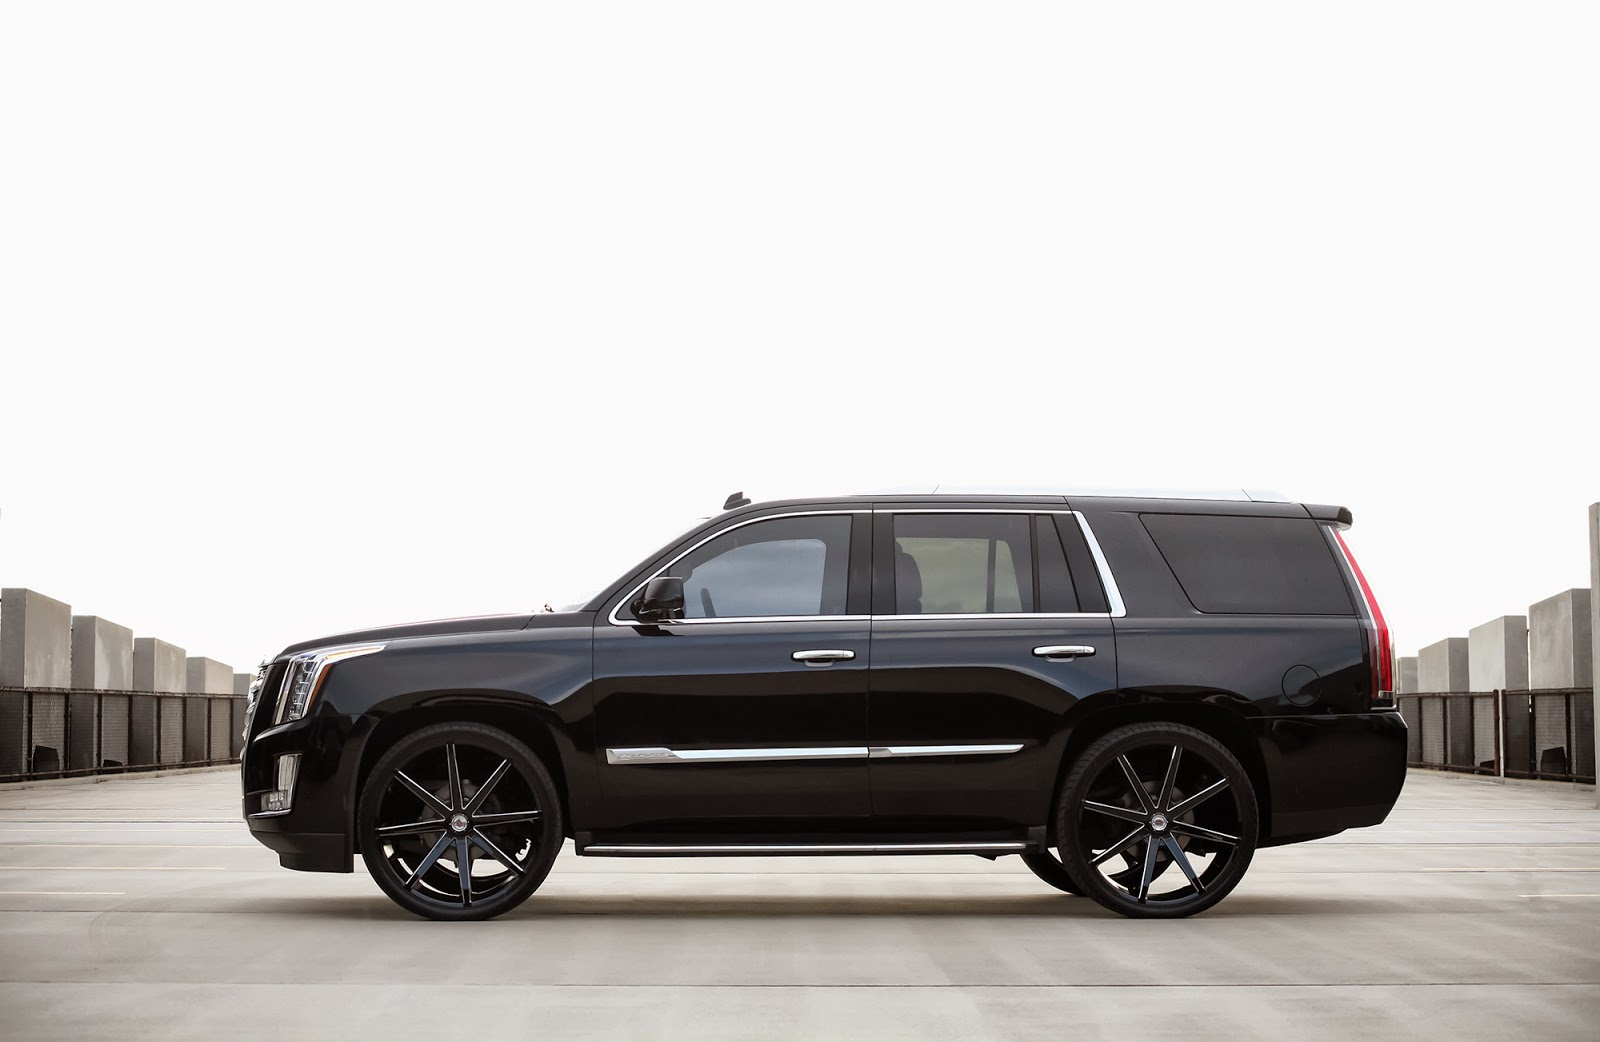 Cadillac On 26 Inch Rims : Cadillac escalade on inch rims autos post